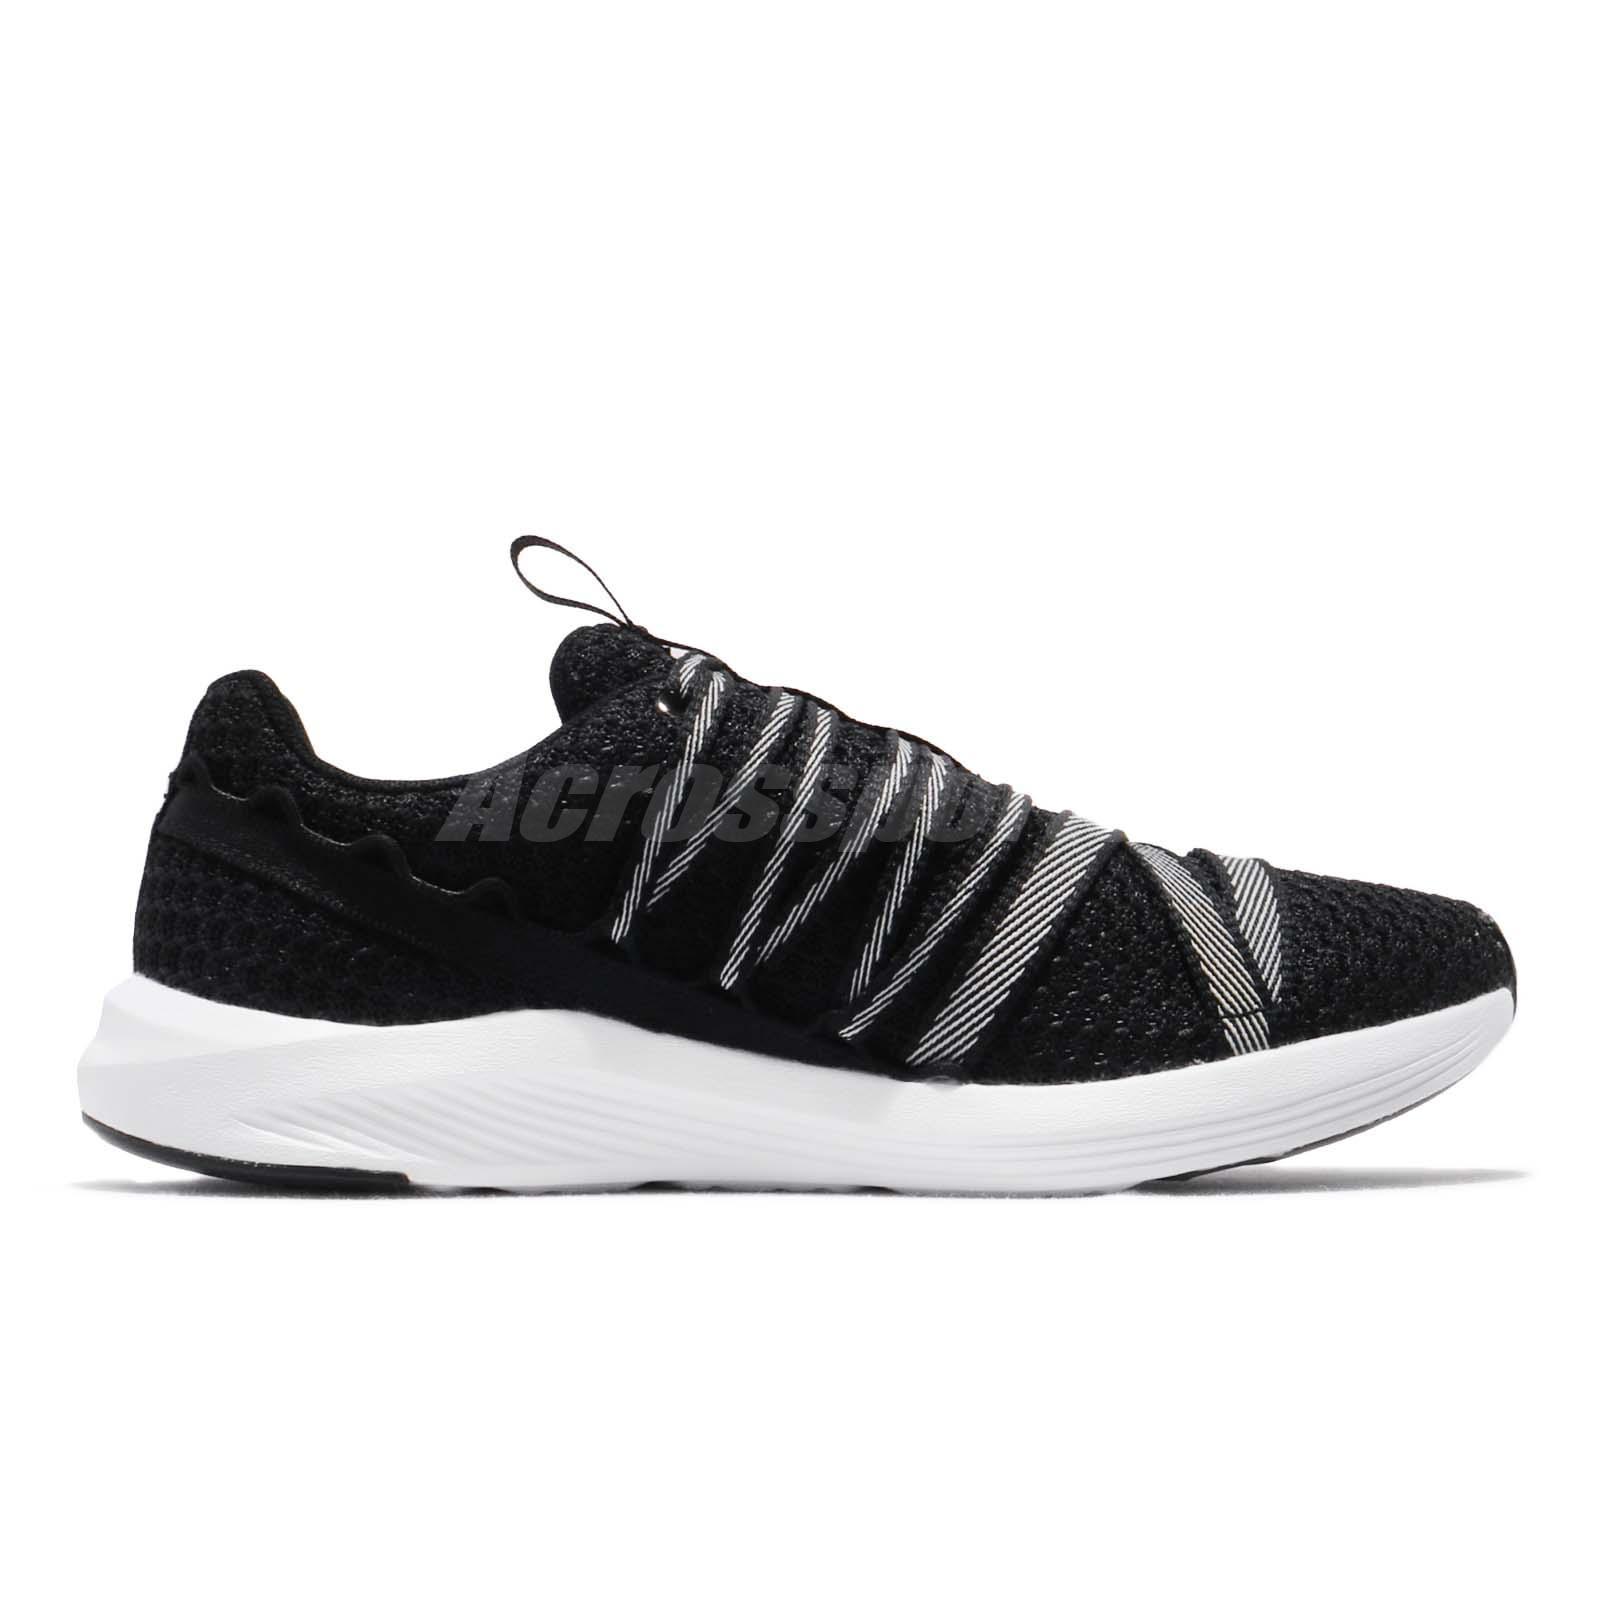 d7d7e37080aa Puma Prowl Alt 2 VT Wns Black White Women Running Shoes Sneakers ...